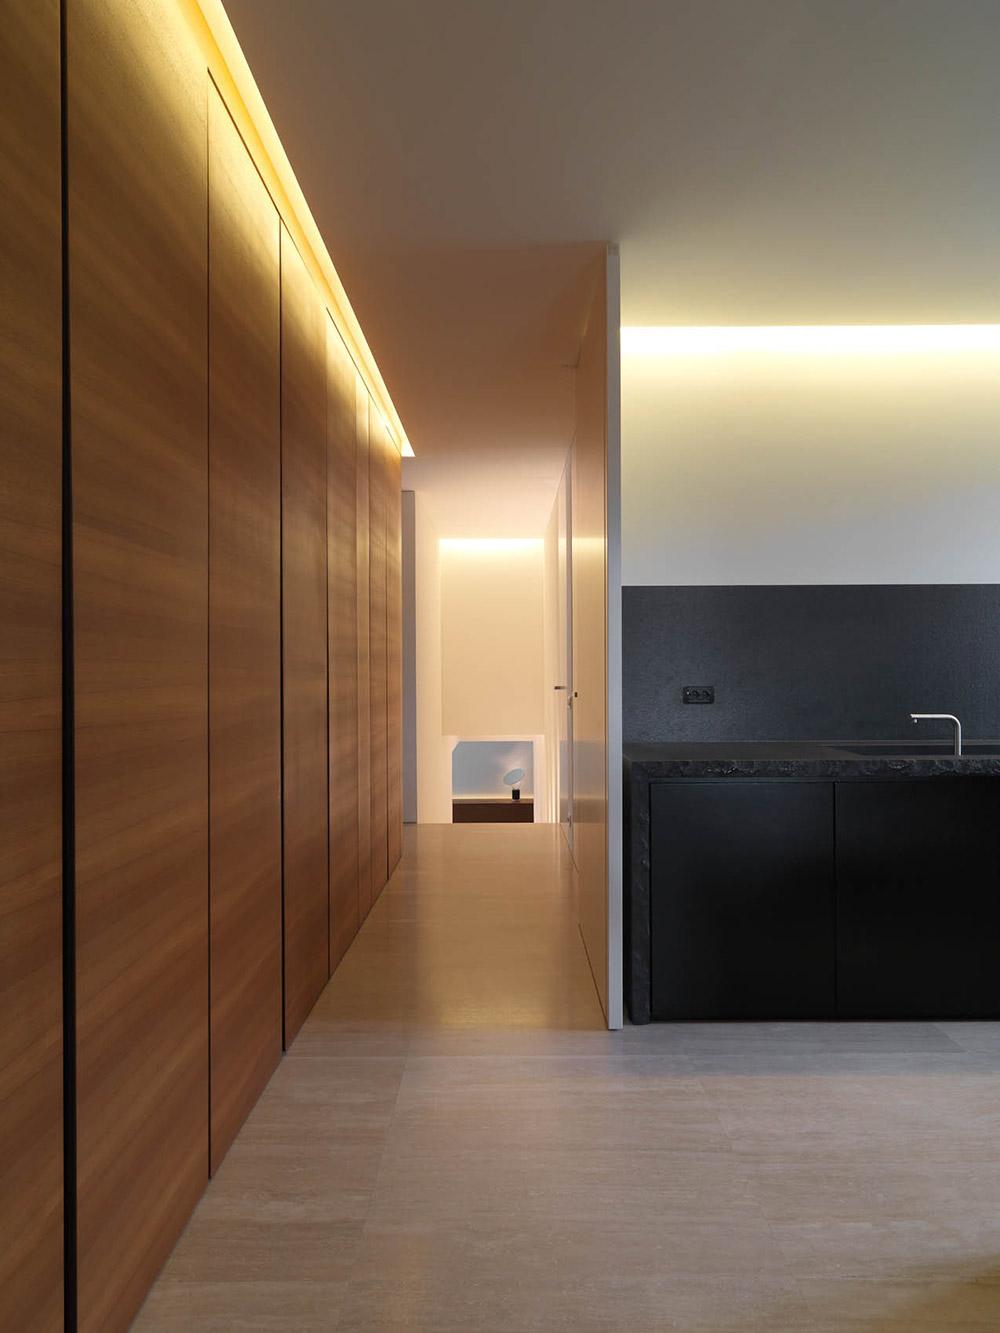 Hall, Minimalist Interior in Tuscany, Italy by Victor Vasilev